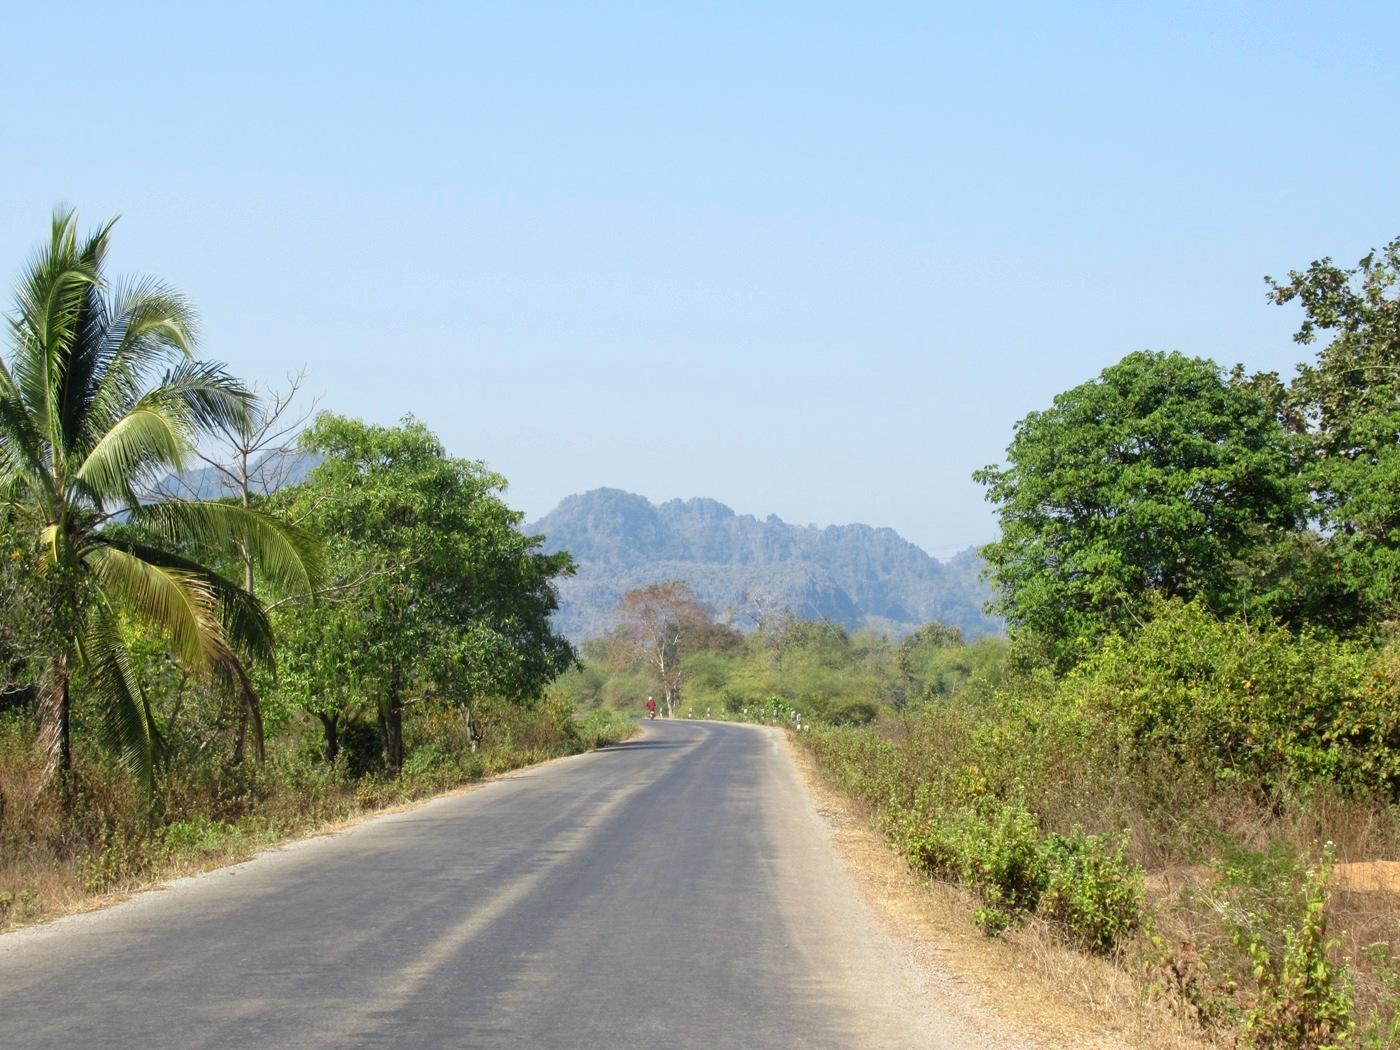 2019-12-laos-thakhek-loop-dia-4-10-carretera